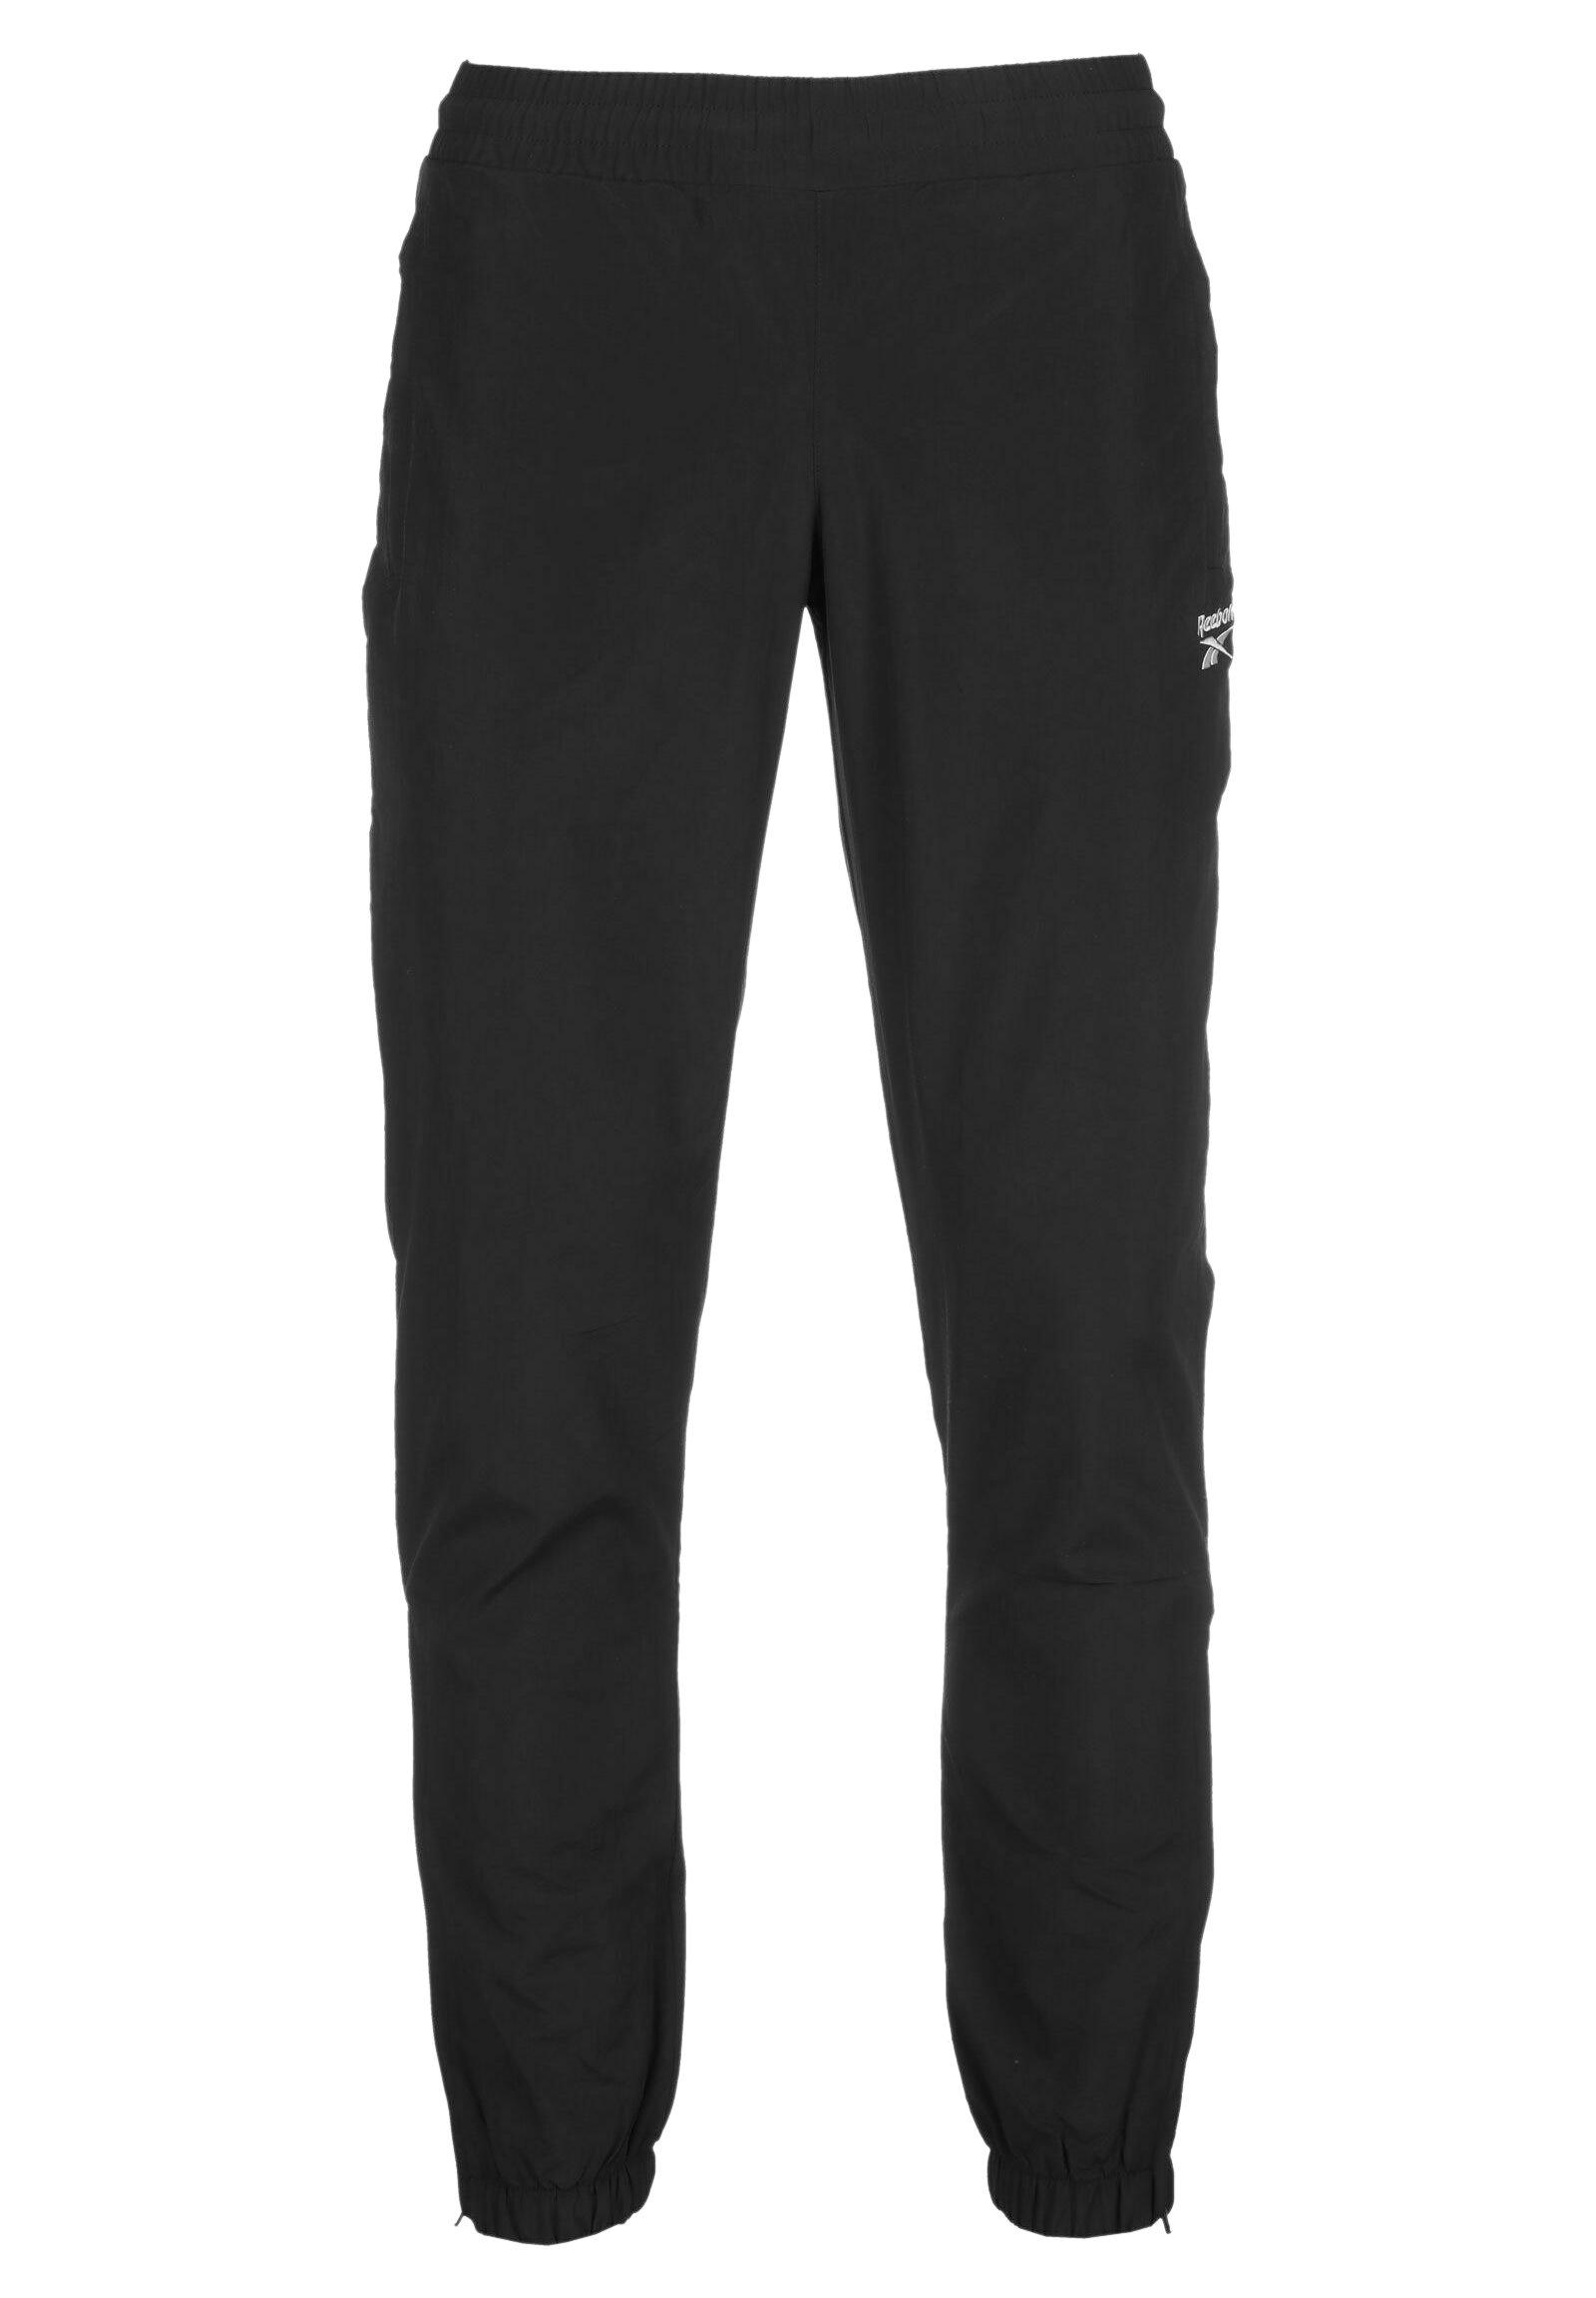 Uomo CLASSIC FR TRACK FOUNDATION GRAPHIC - Pantaloni sportivi